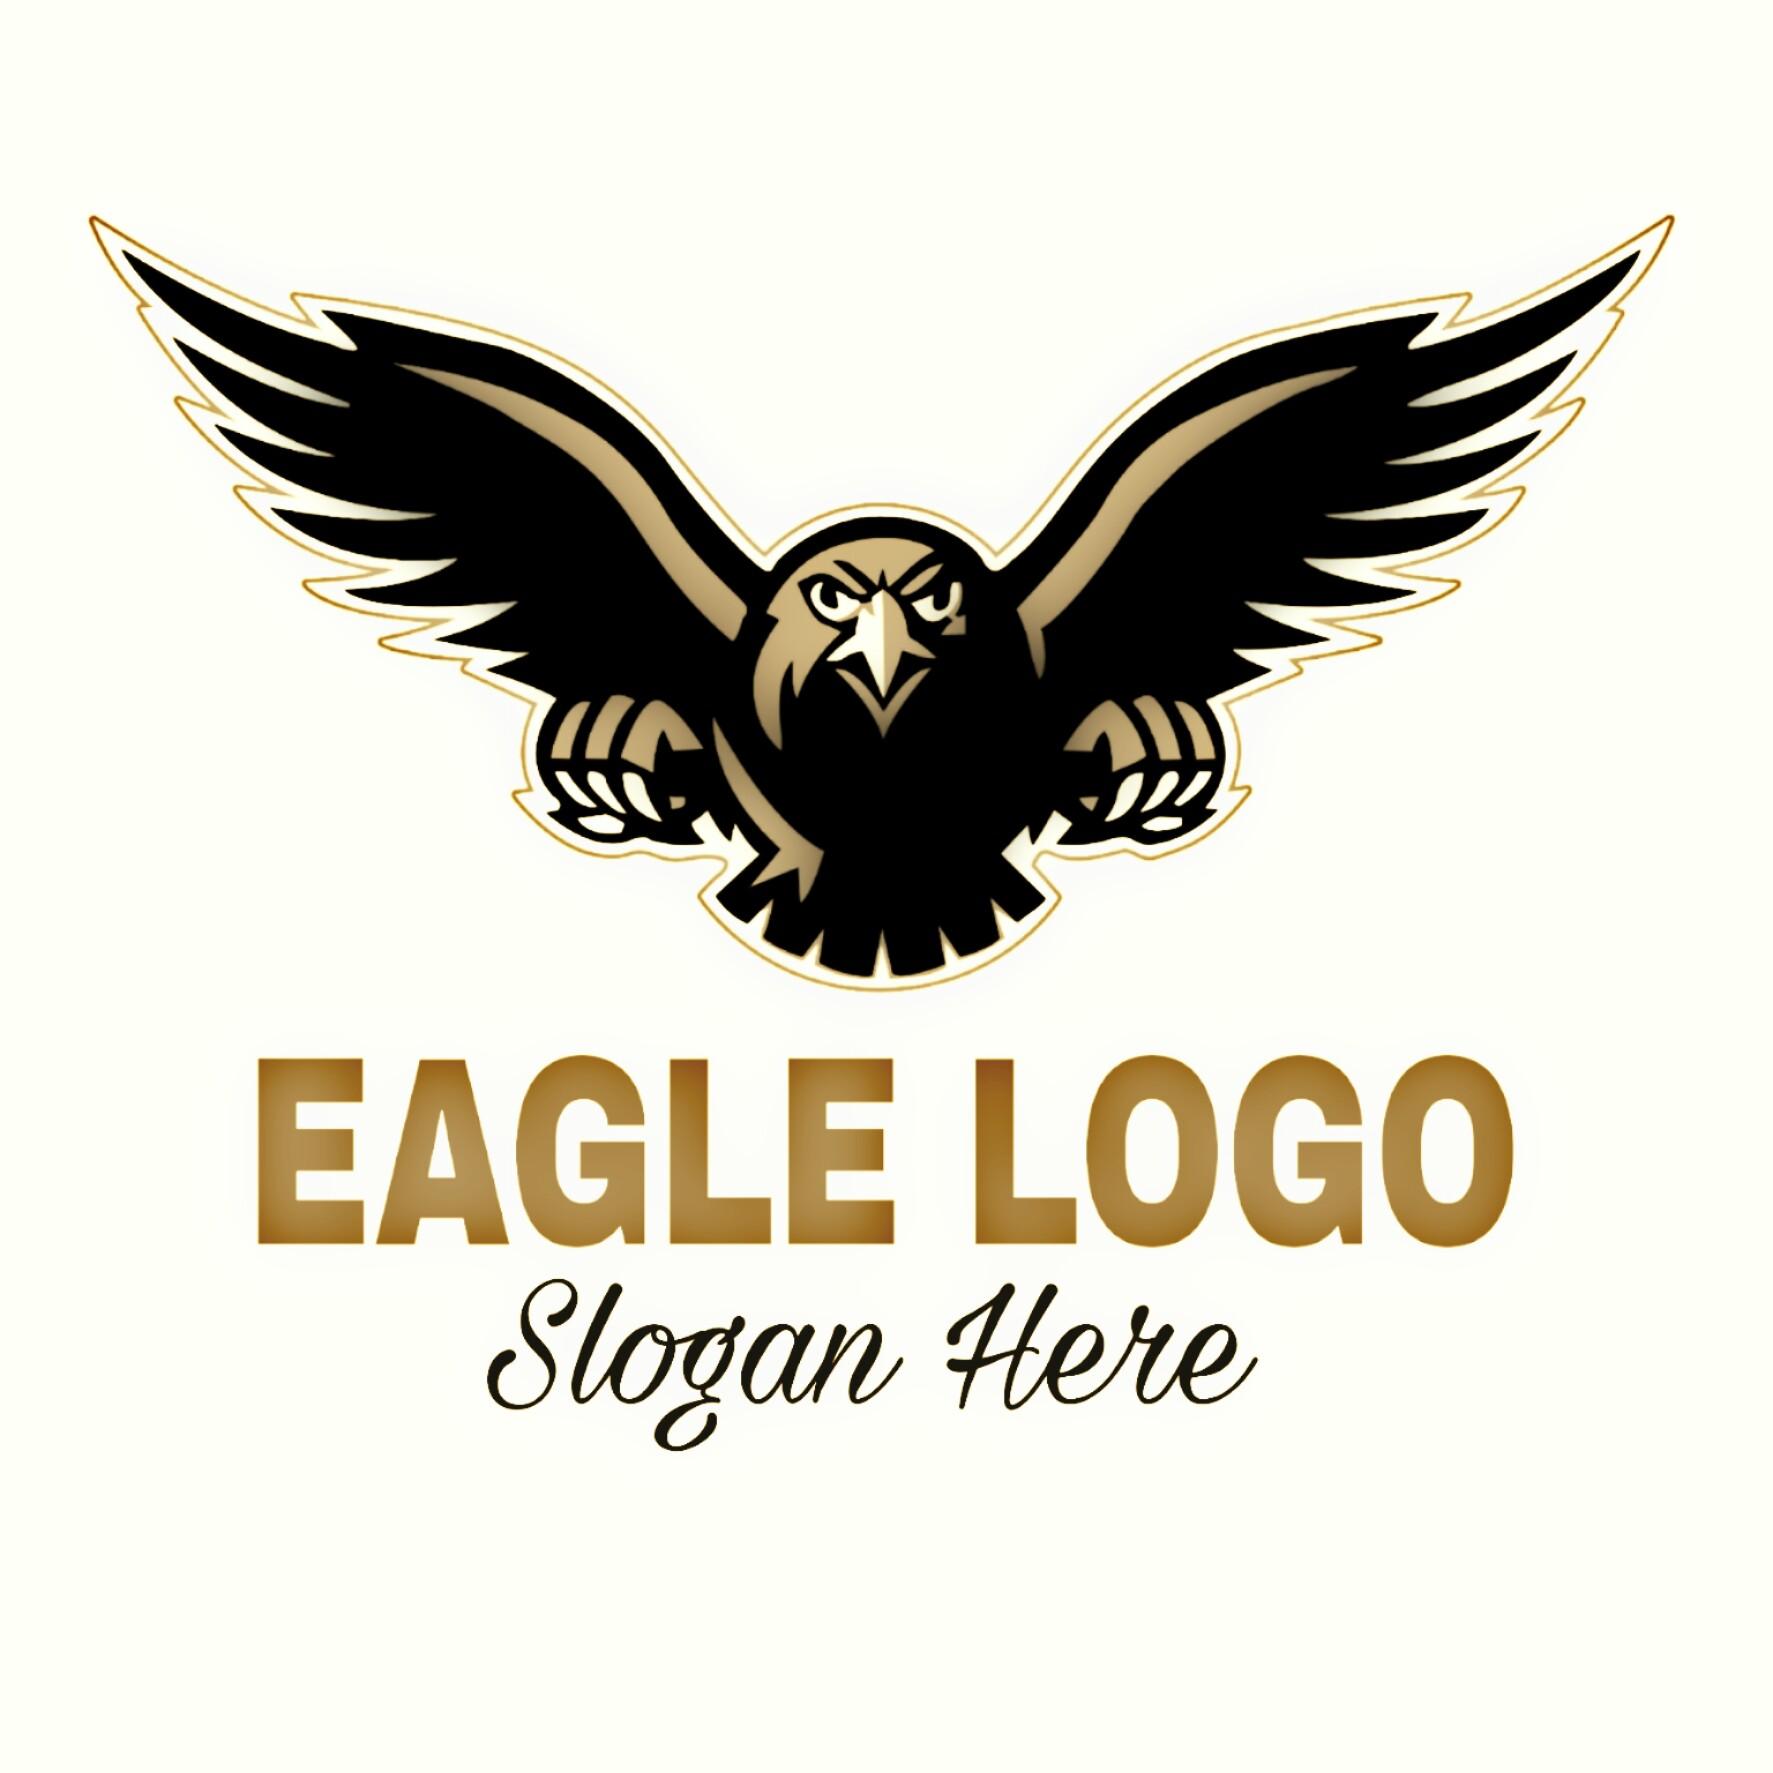 I will make a simple creative logo design